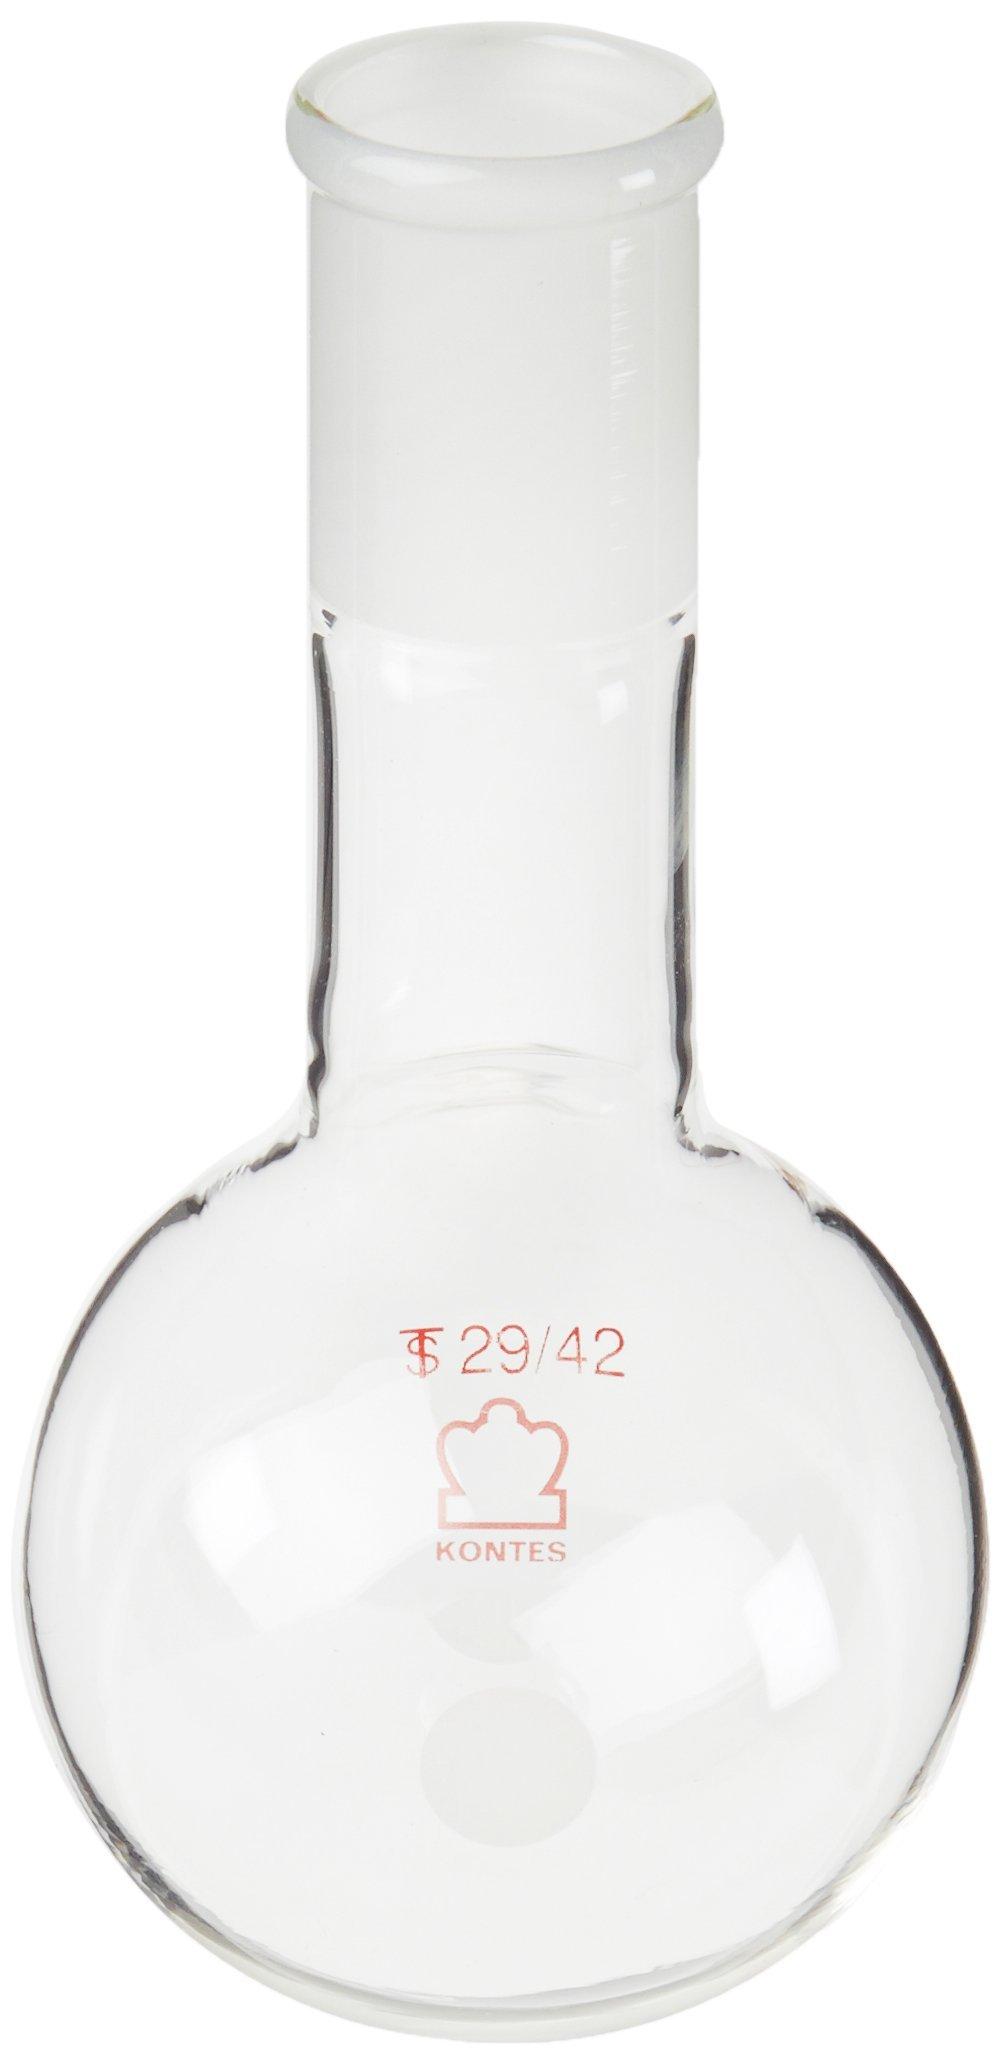 Kimble 601010-0429 Borosilicate Glass Long Neck Round Bottom Distilling Flask, Heavy Wall, Standard Taper Joint, 250 ml Capacity